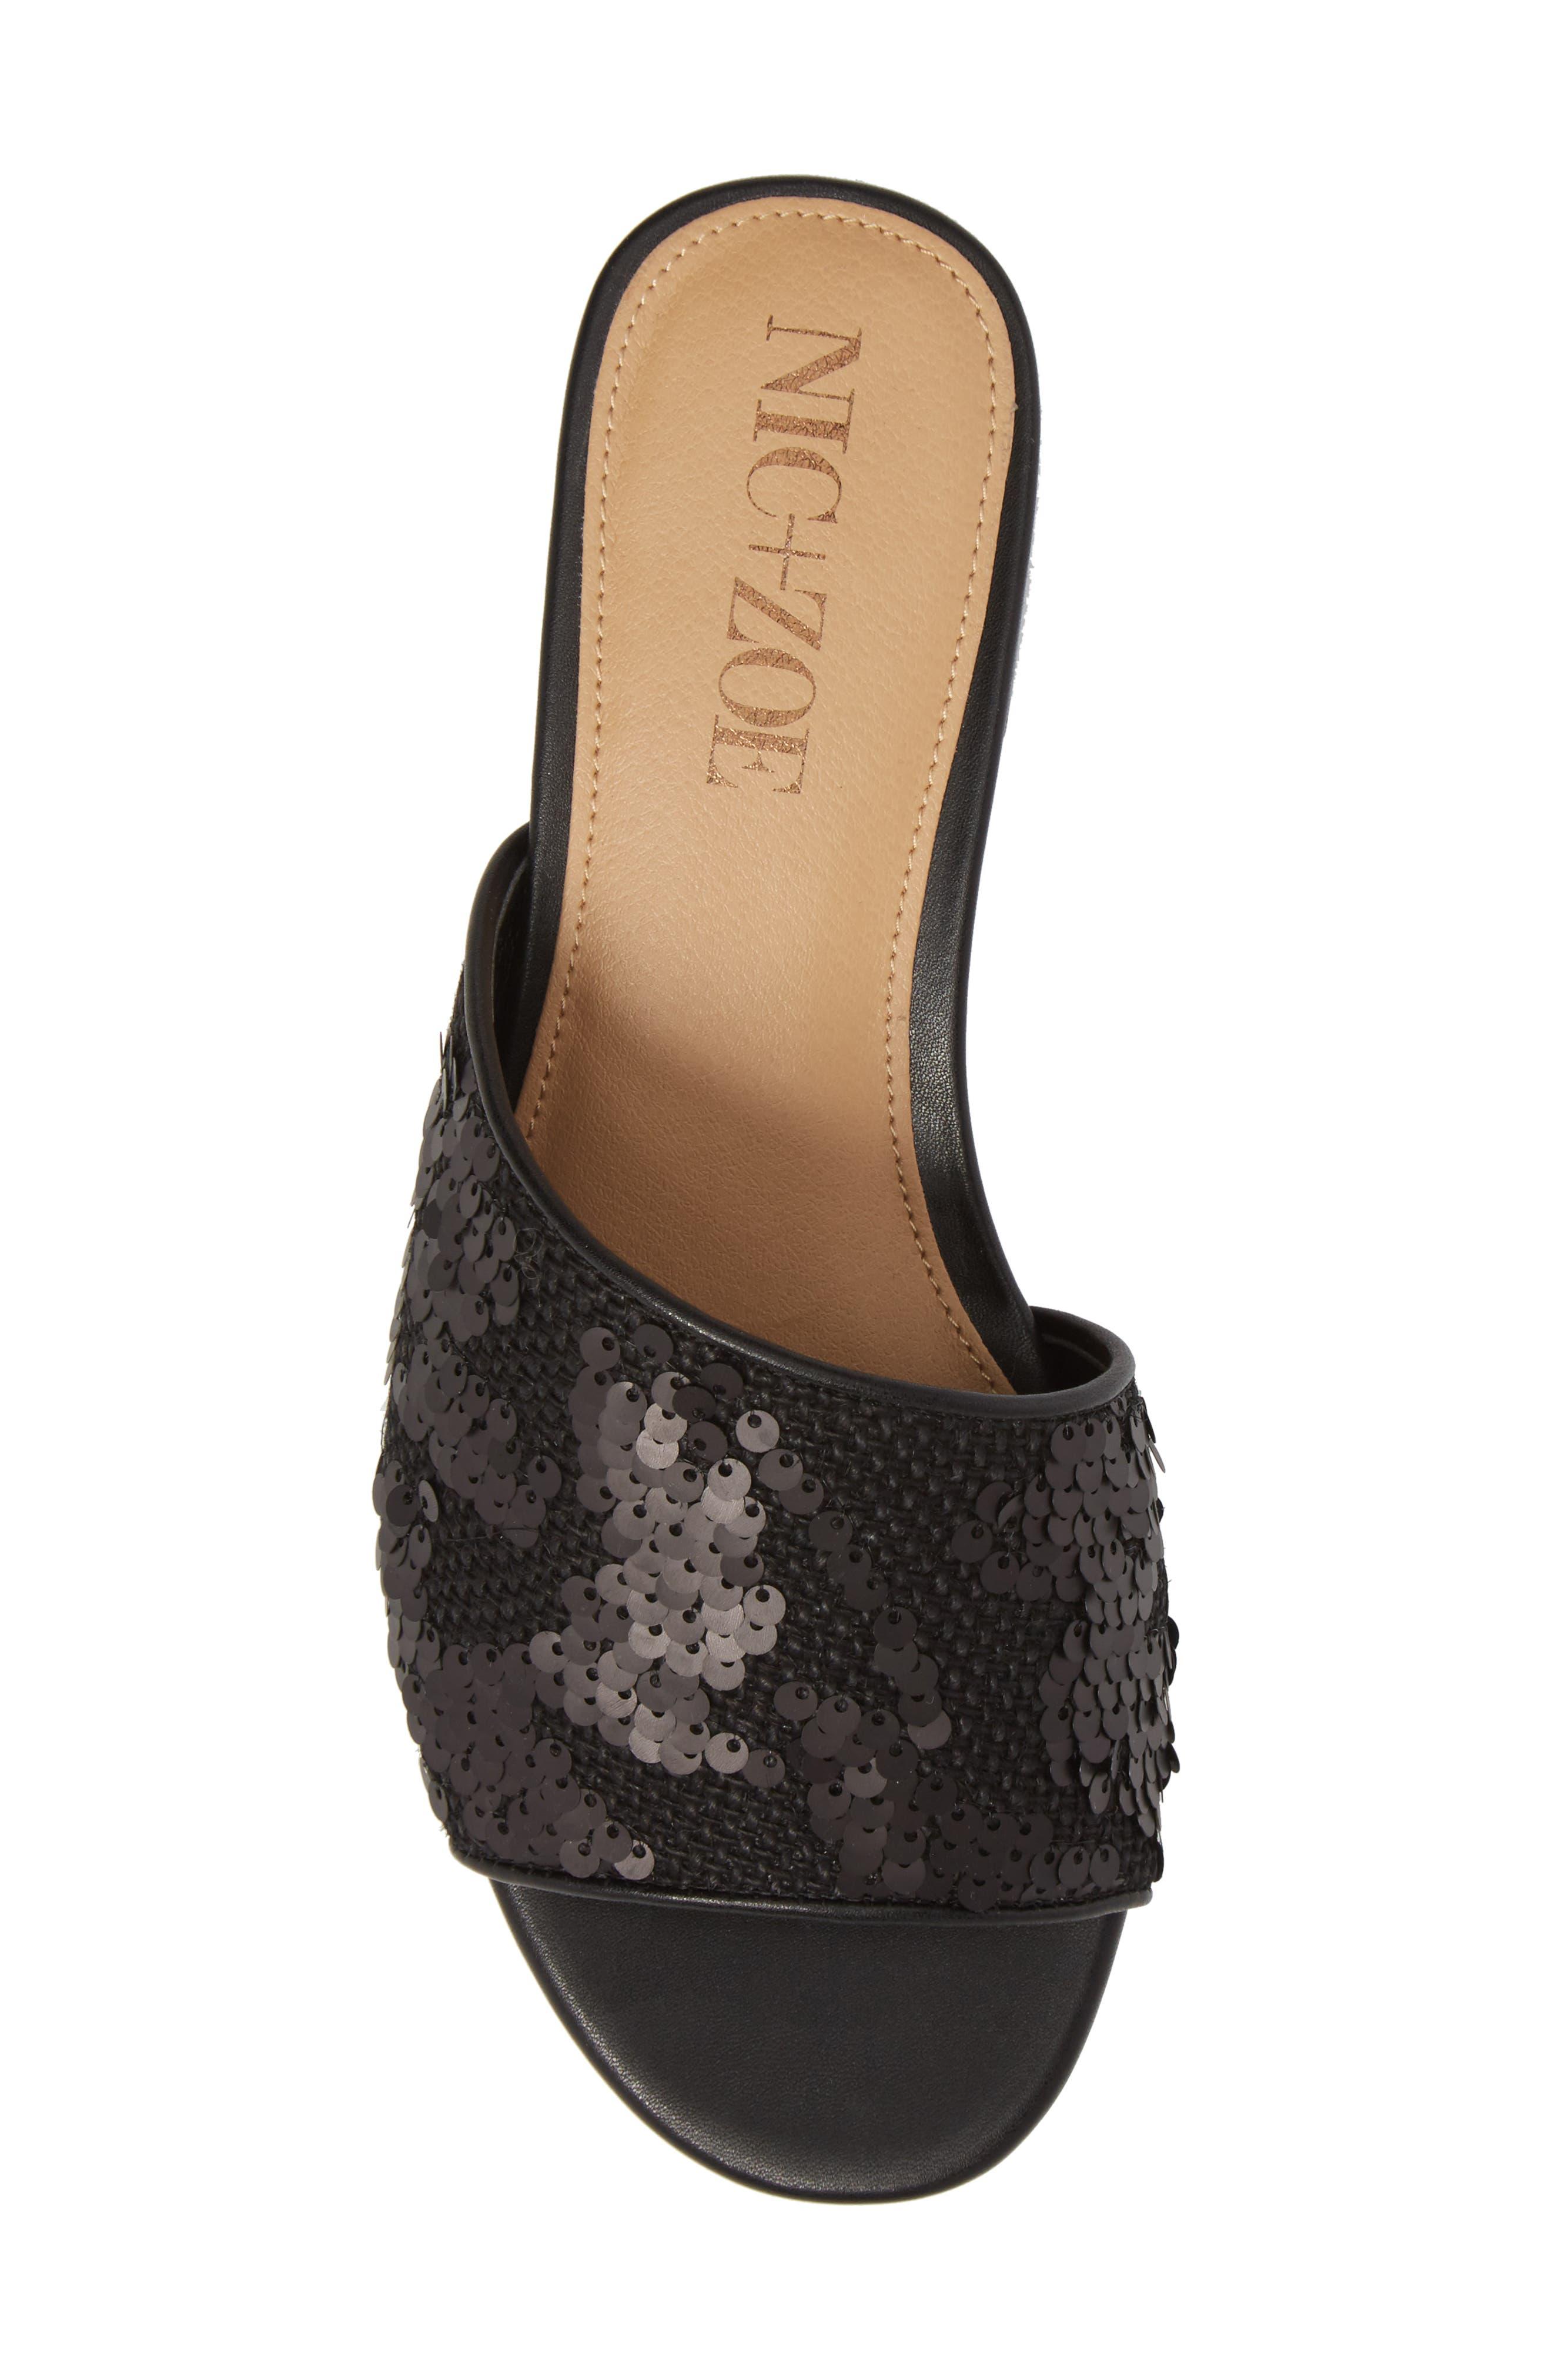 Stella Slide Sandal,                             Alternate thumbnail 5, color,                             Black Sequin Fabric